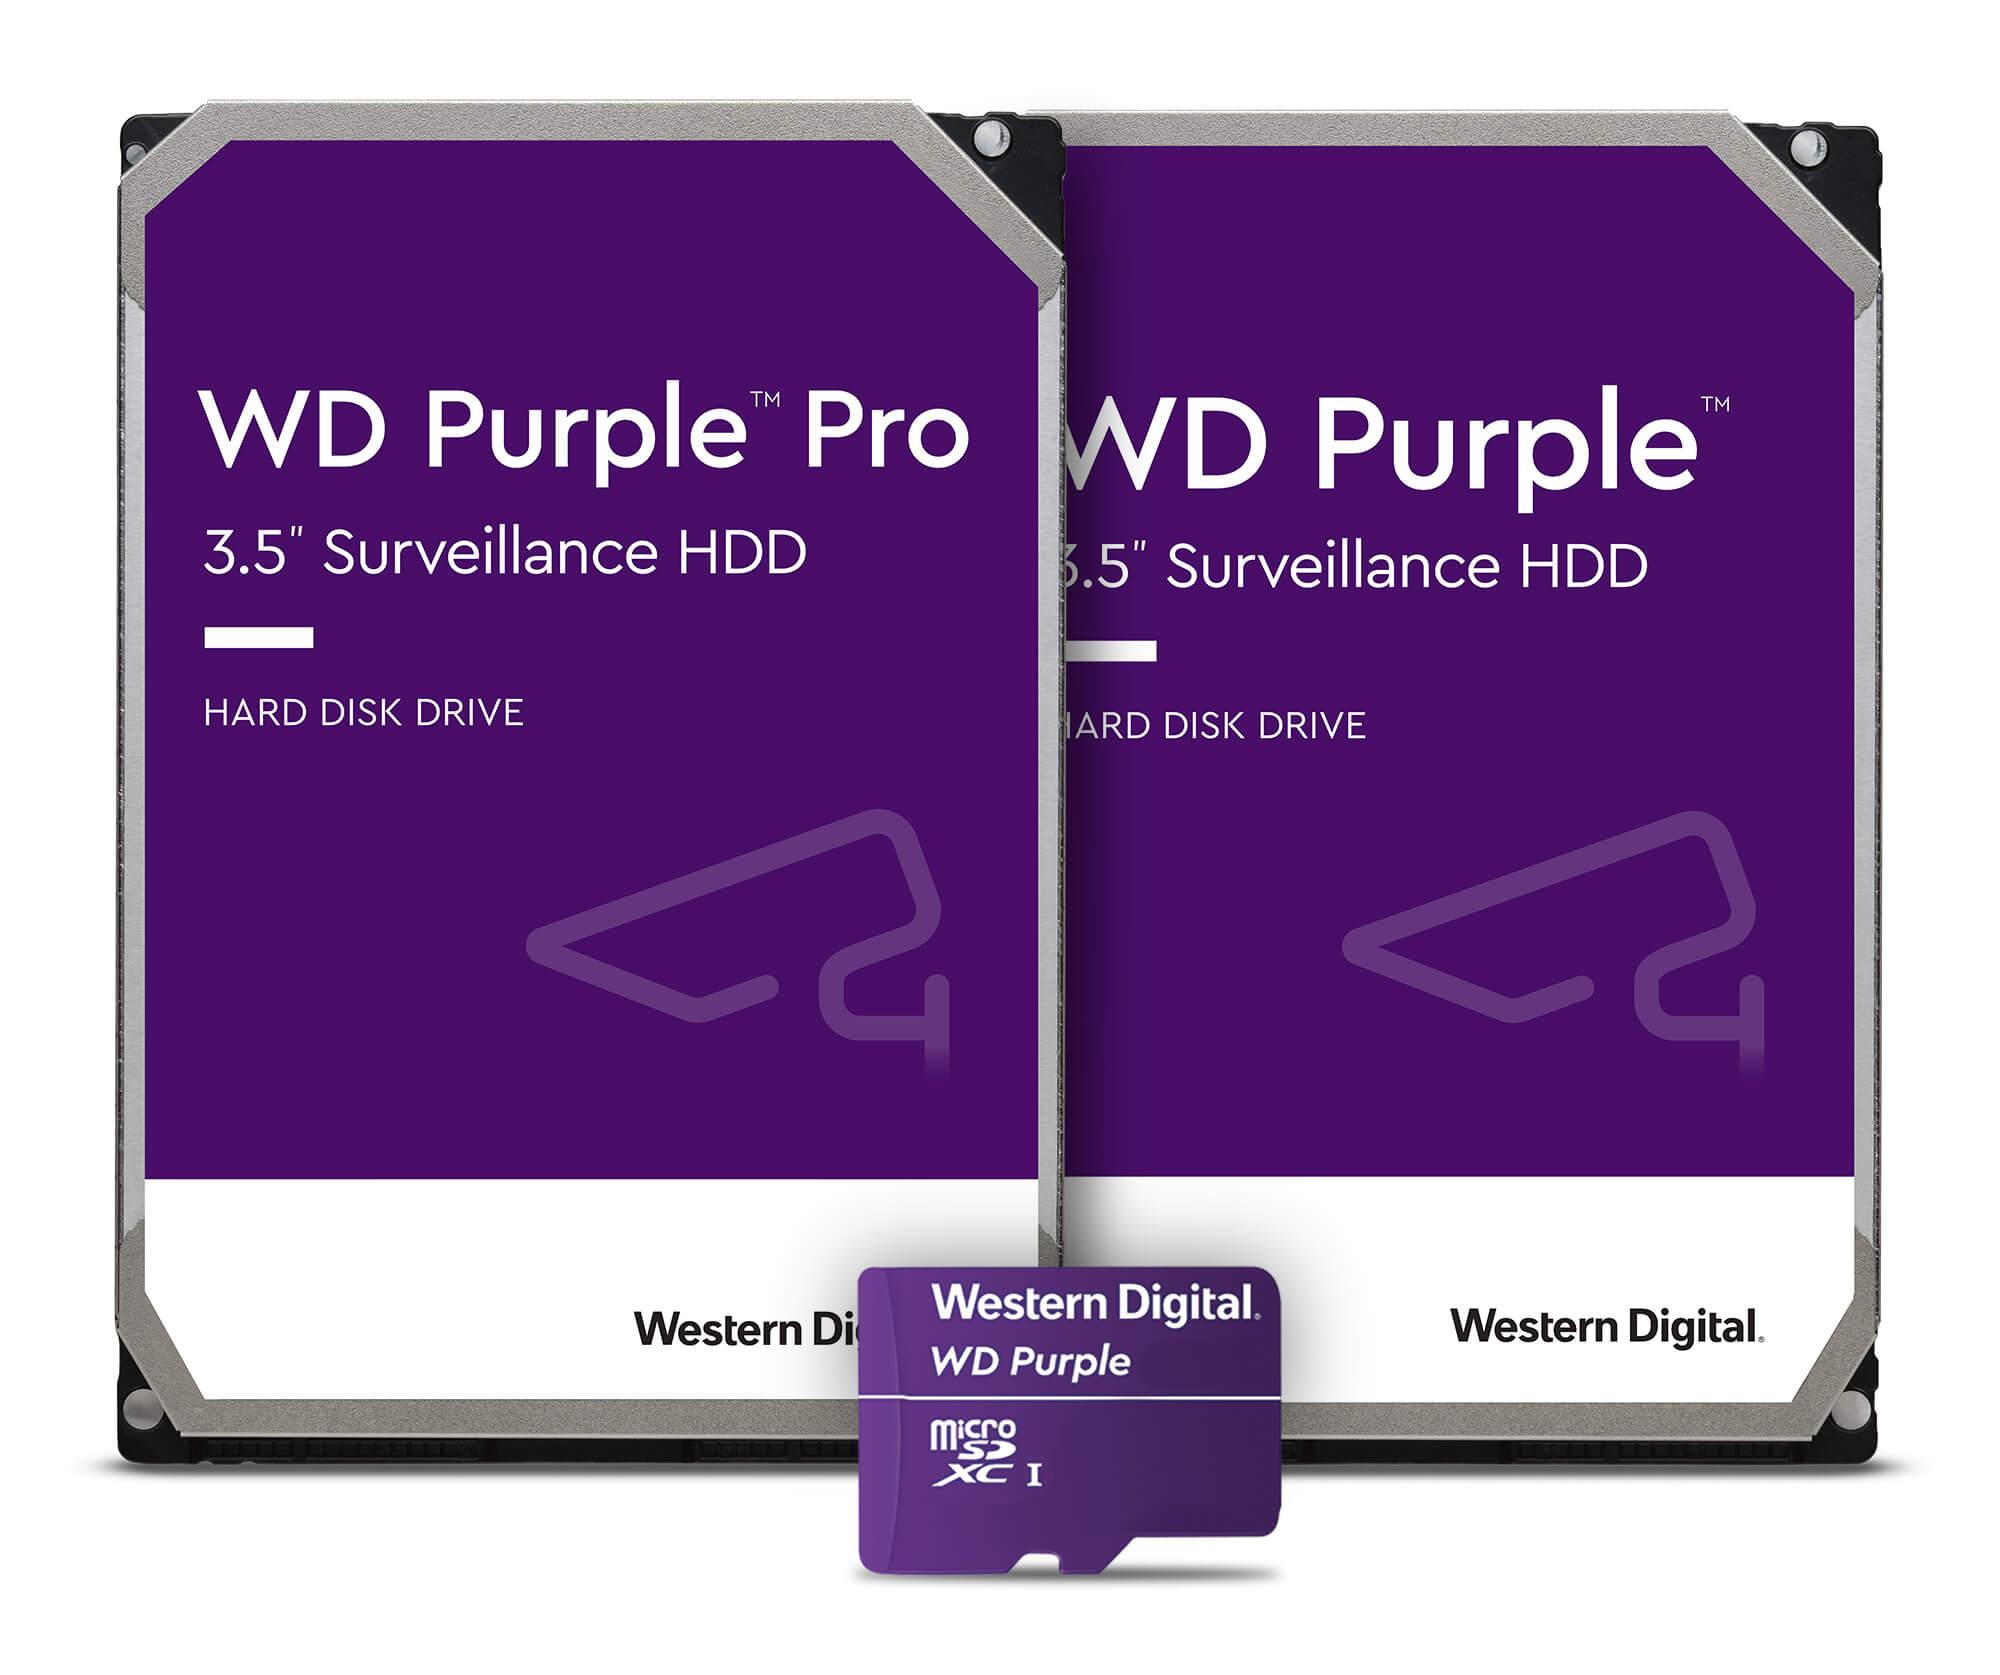 WD Purple Family